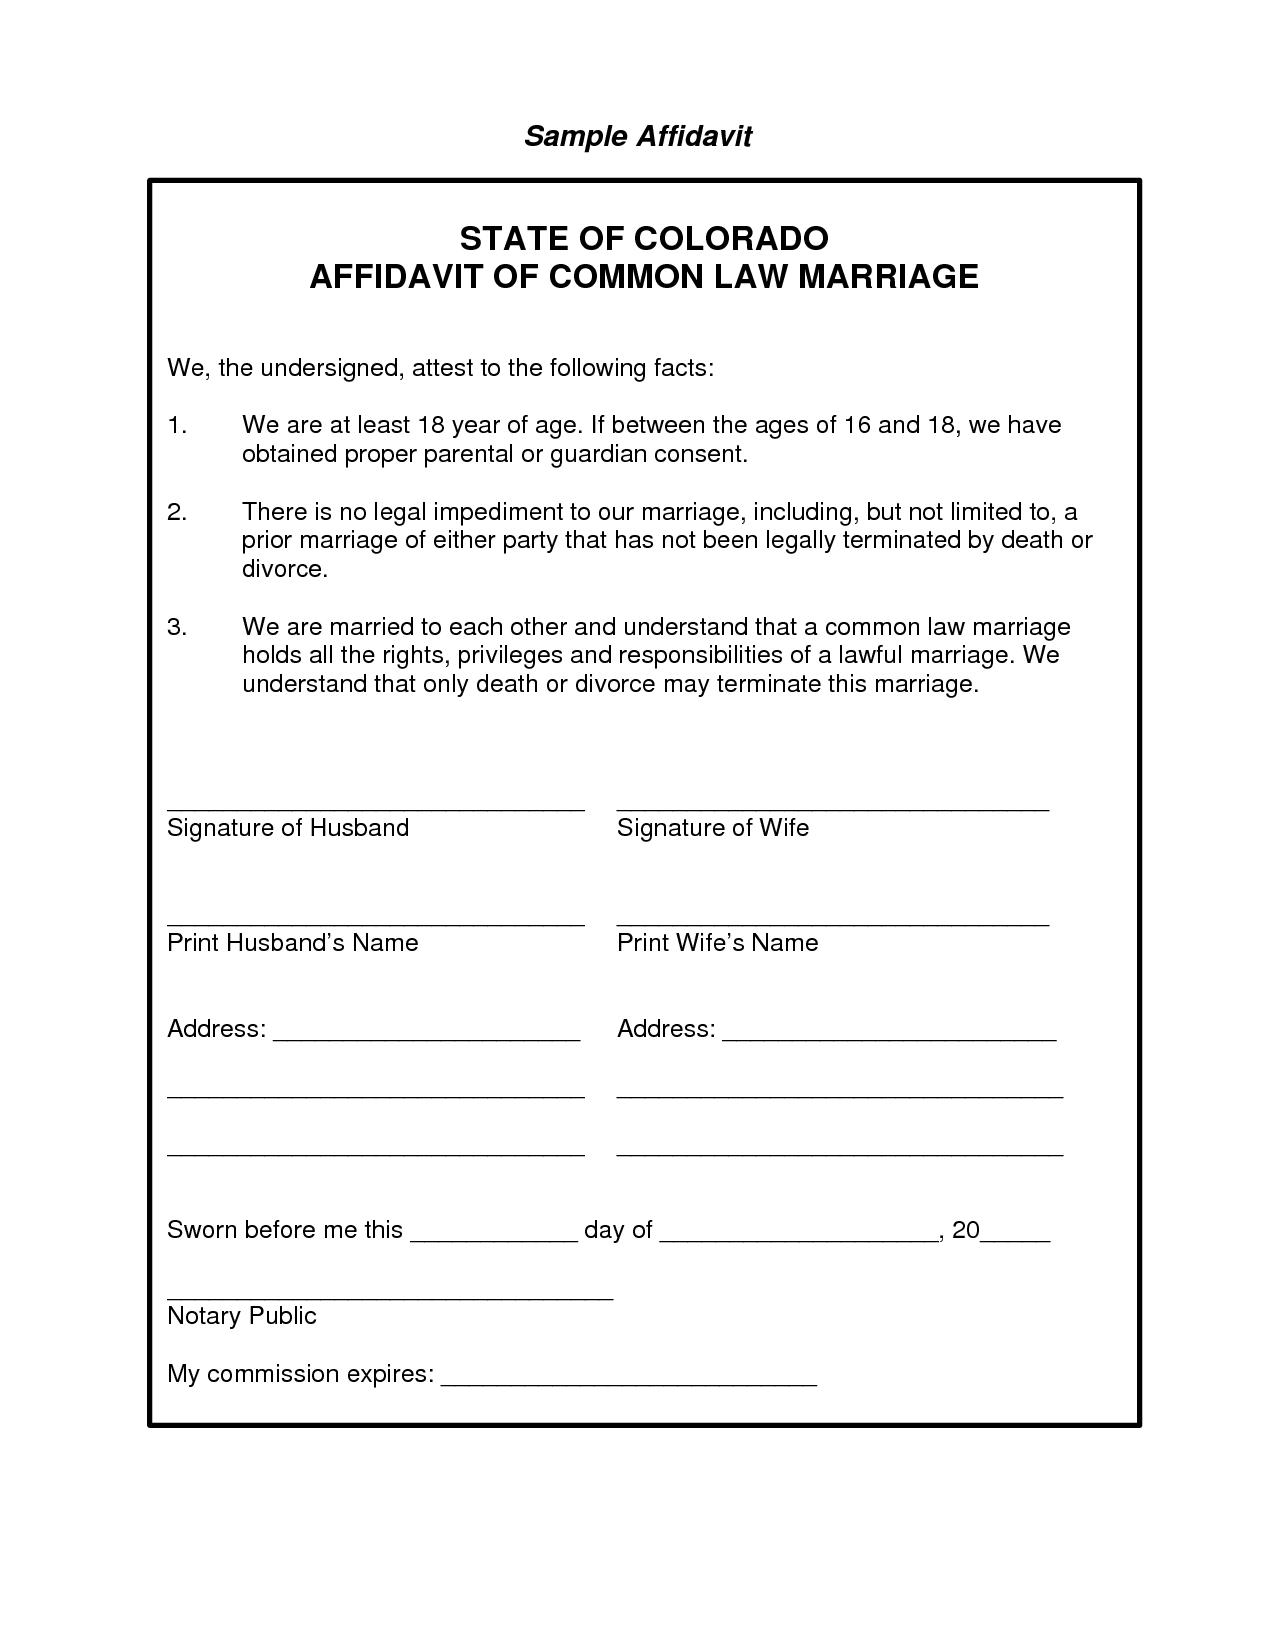 Sworn Affidavit Template affidavit form create free general – General Affidavit Sample